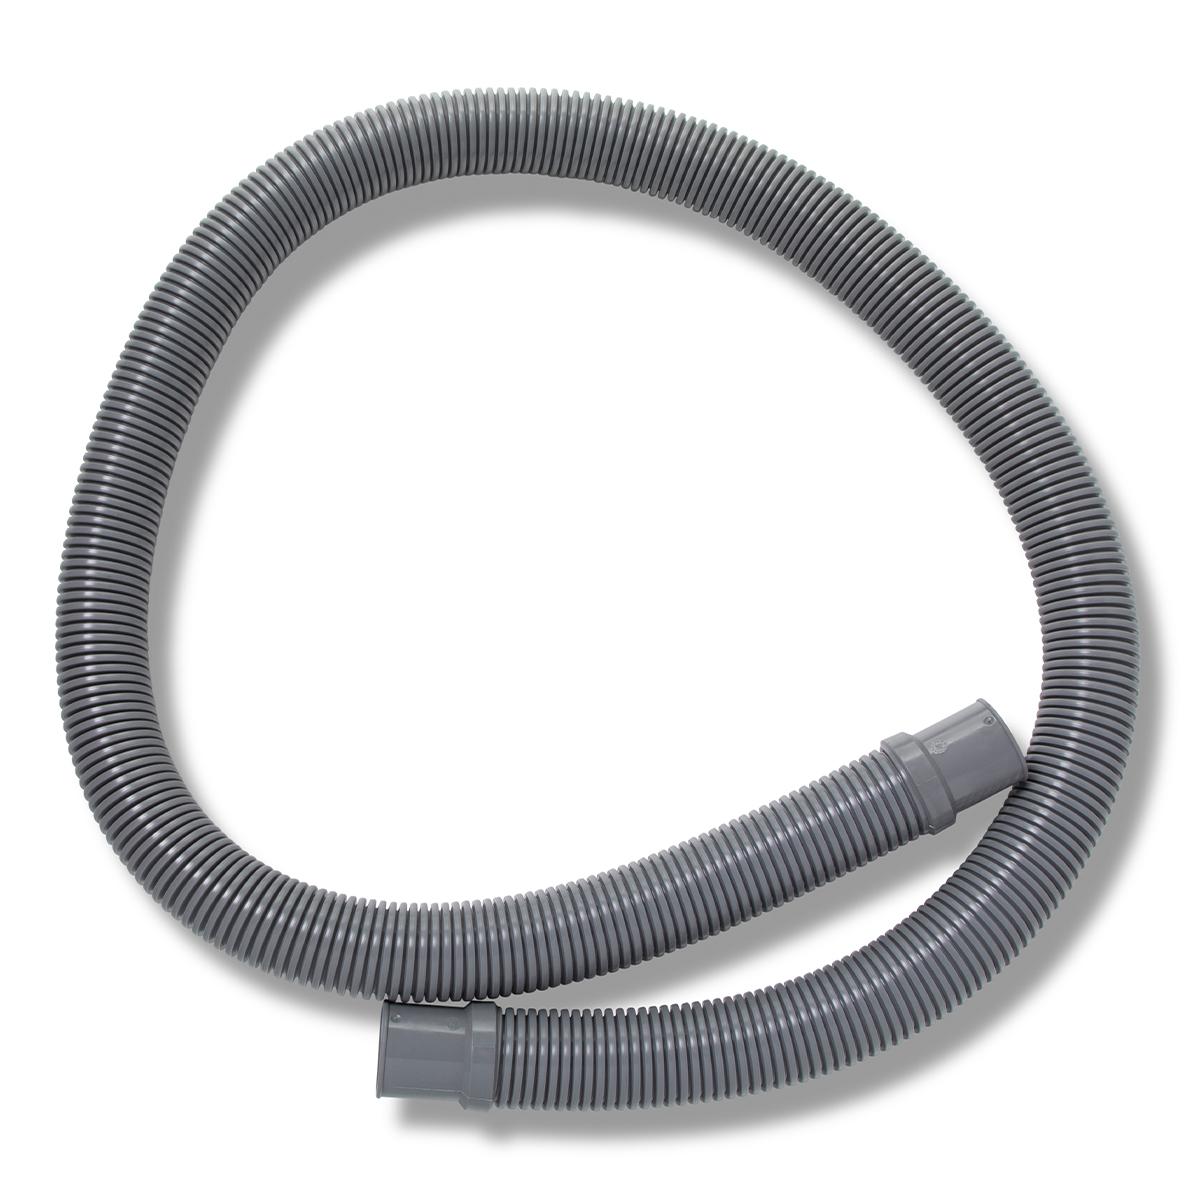 6ft hose